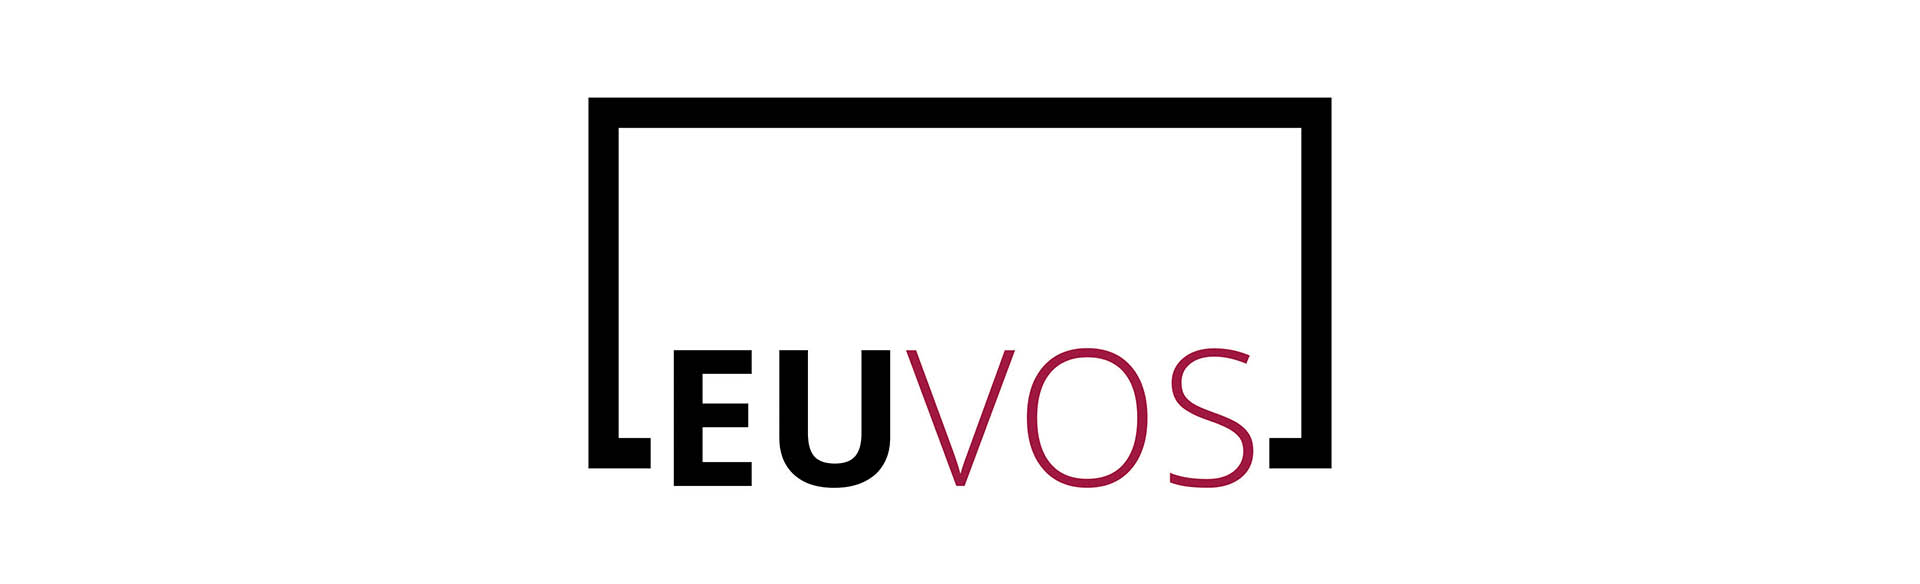 EUVOS. Patrimonio Cultural Inmaterial. Para un Programa Europeo de Subtitulado en Linguas Non Hexemónicas